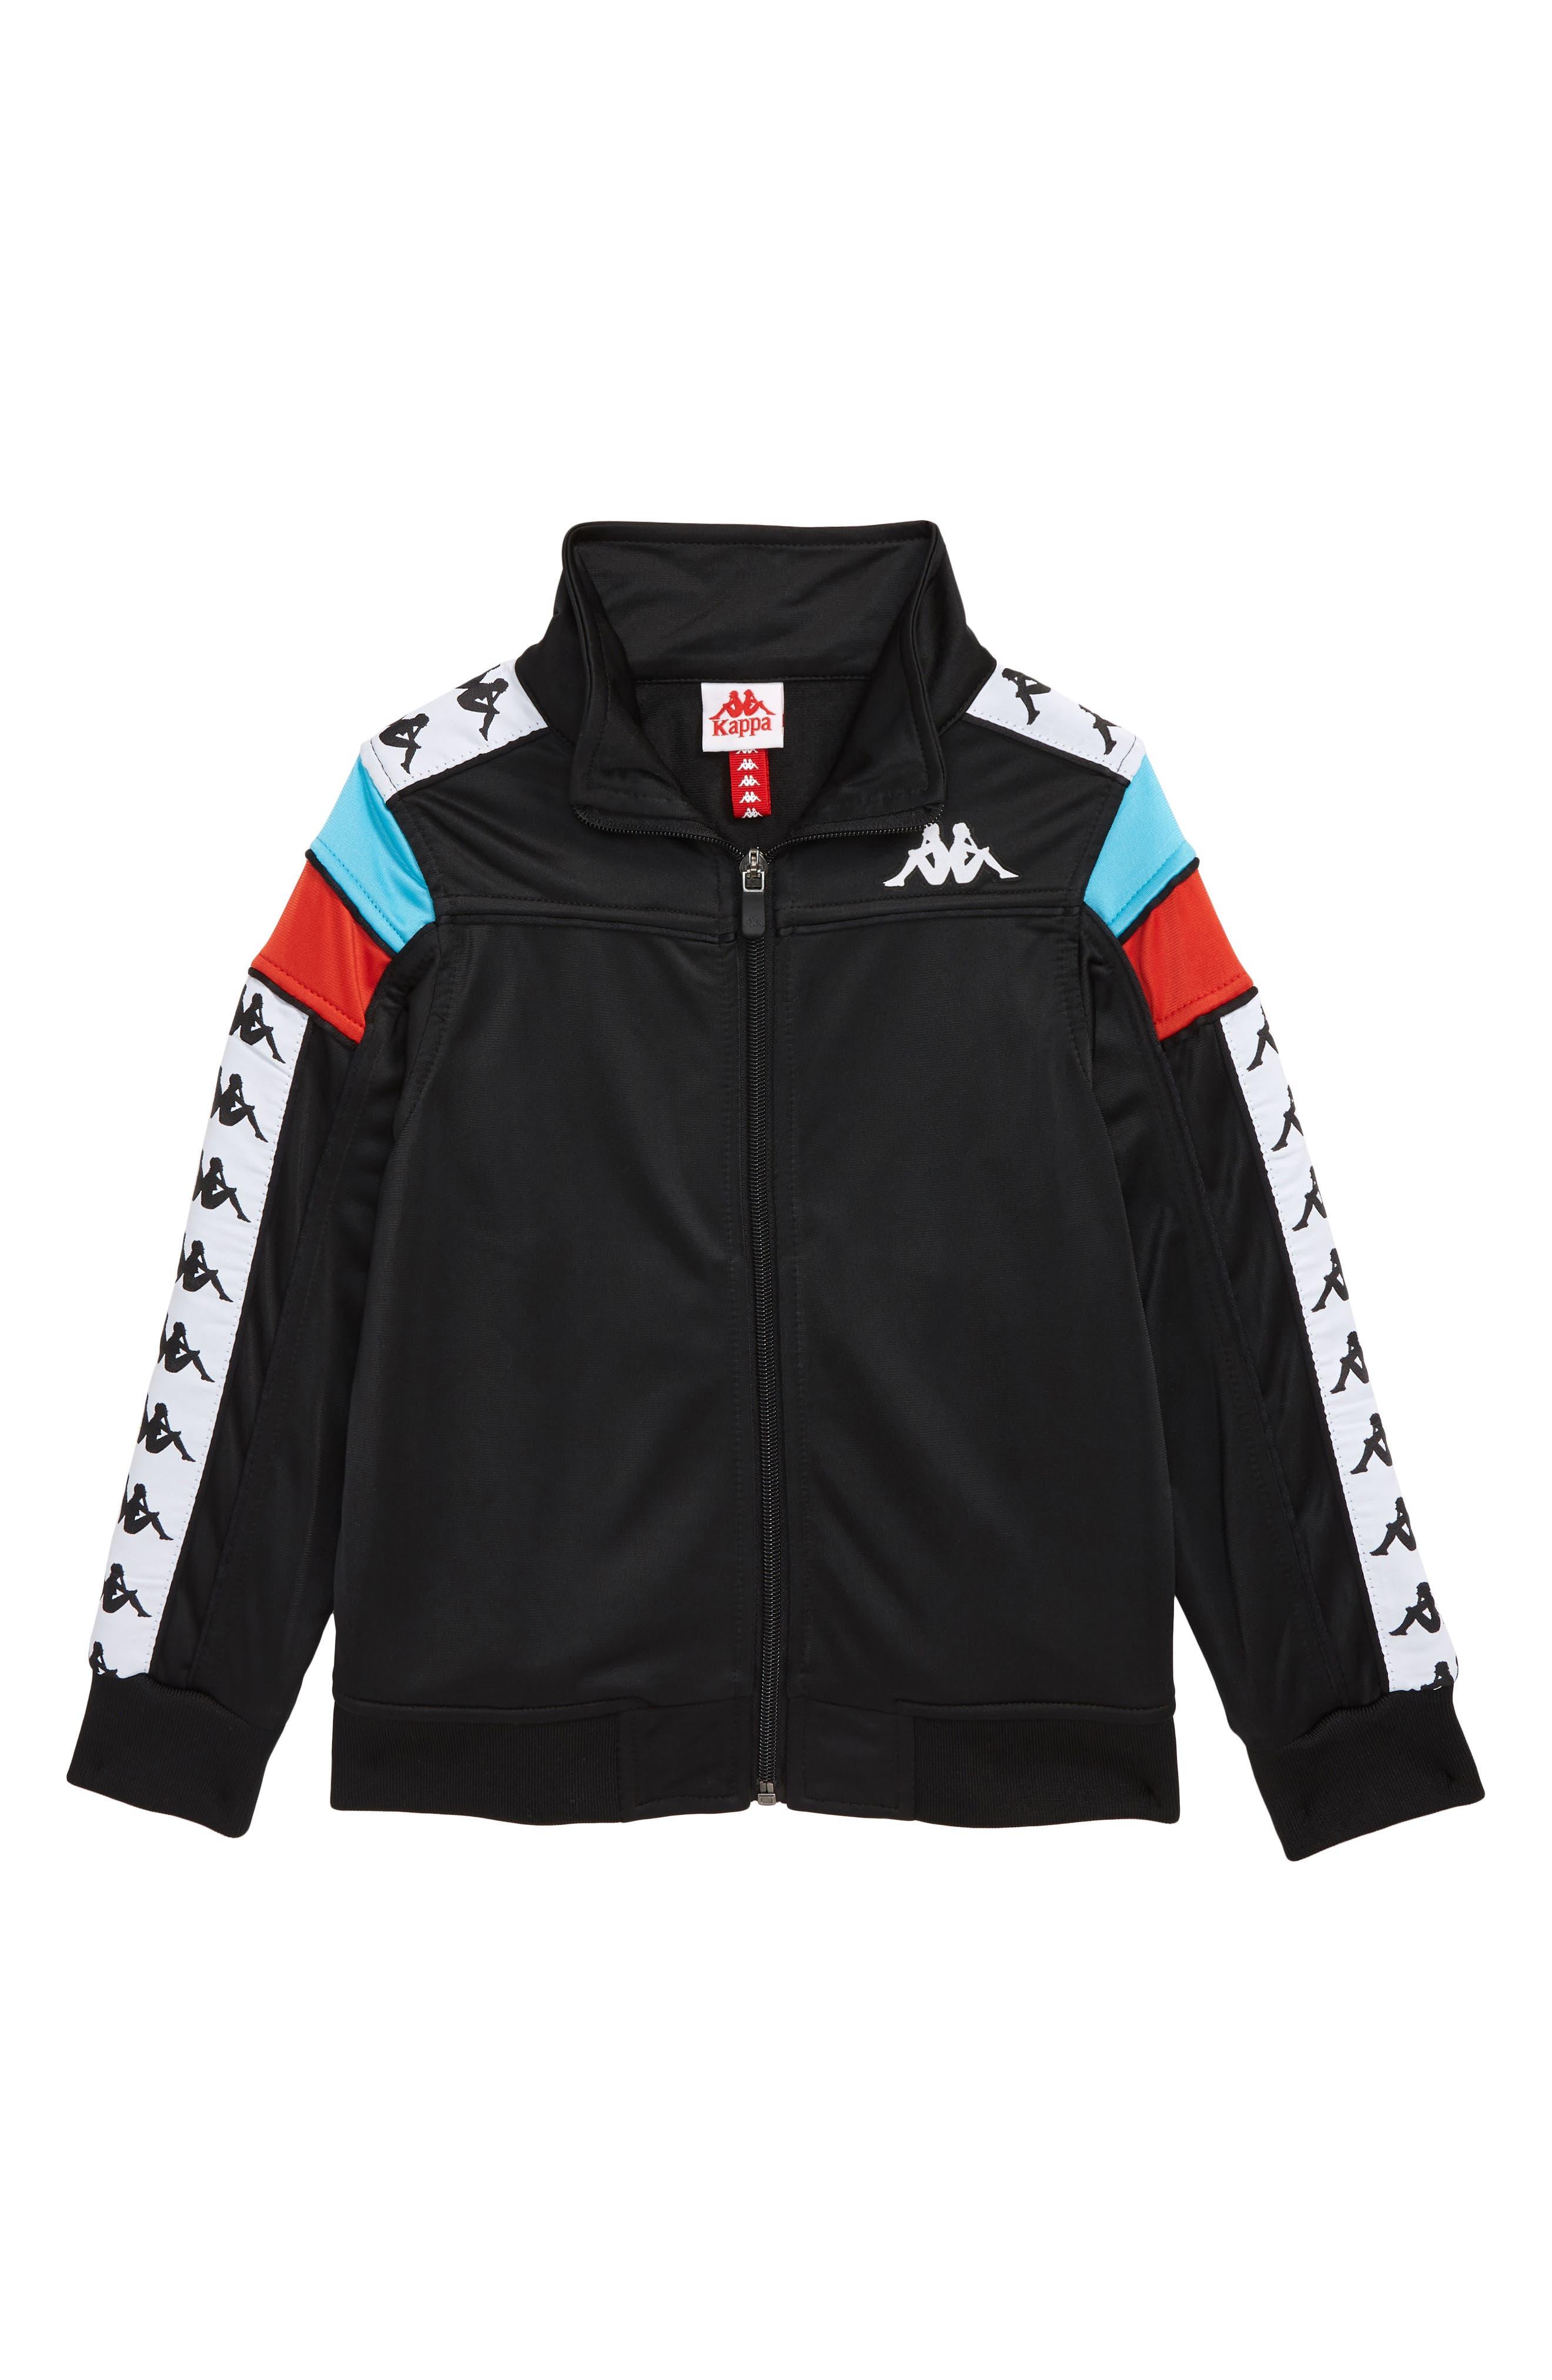 Image of Kappa Active Banda Merez Slim Track Jacket